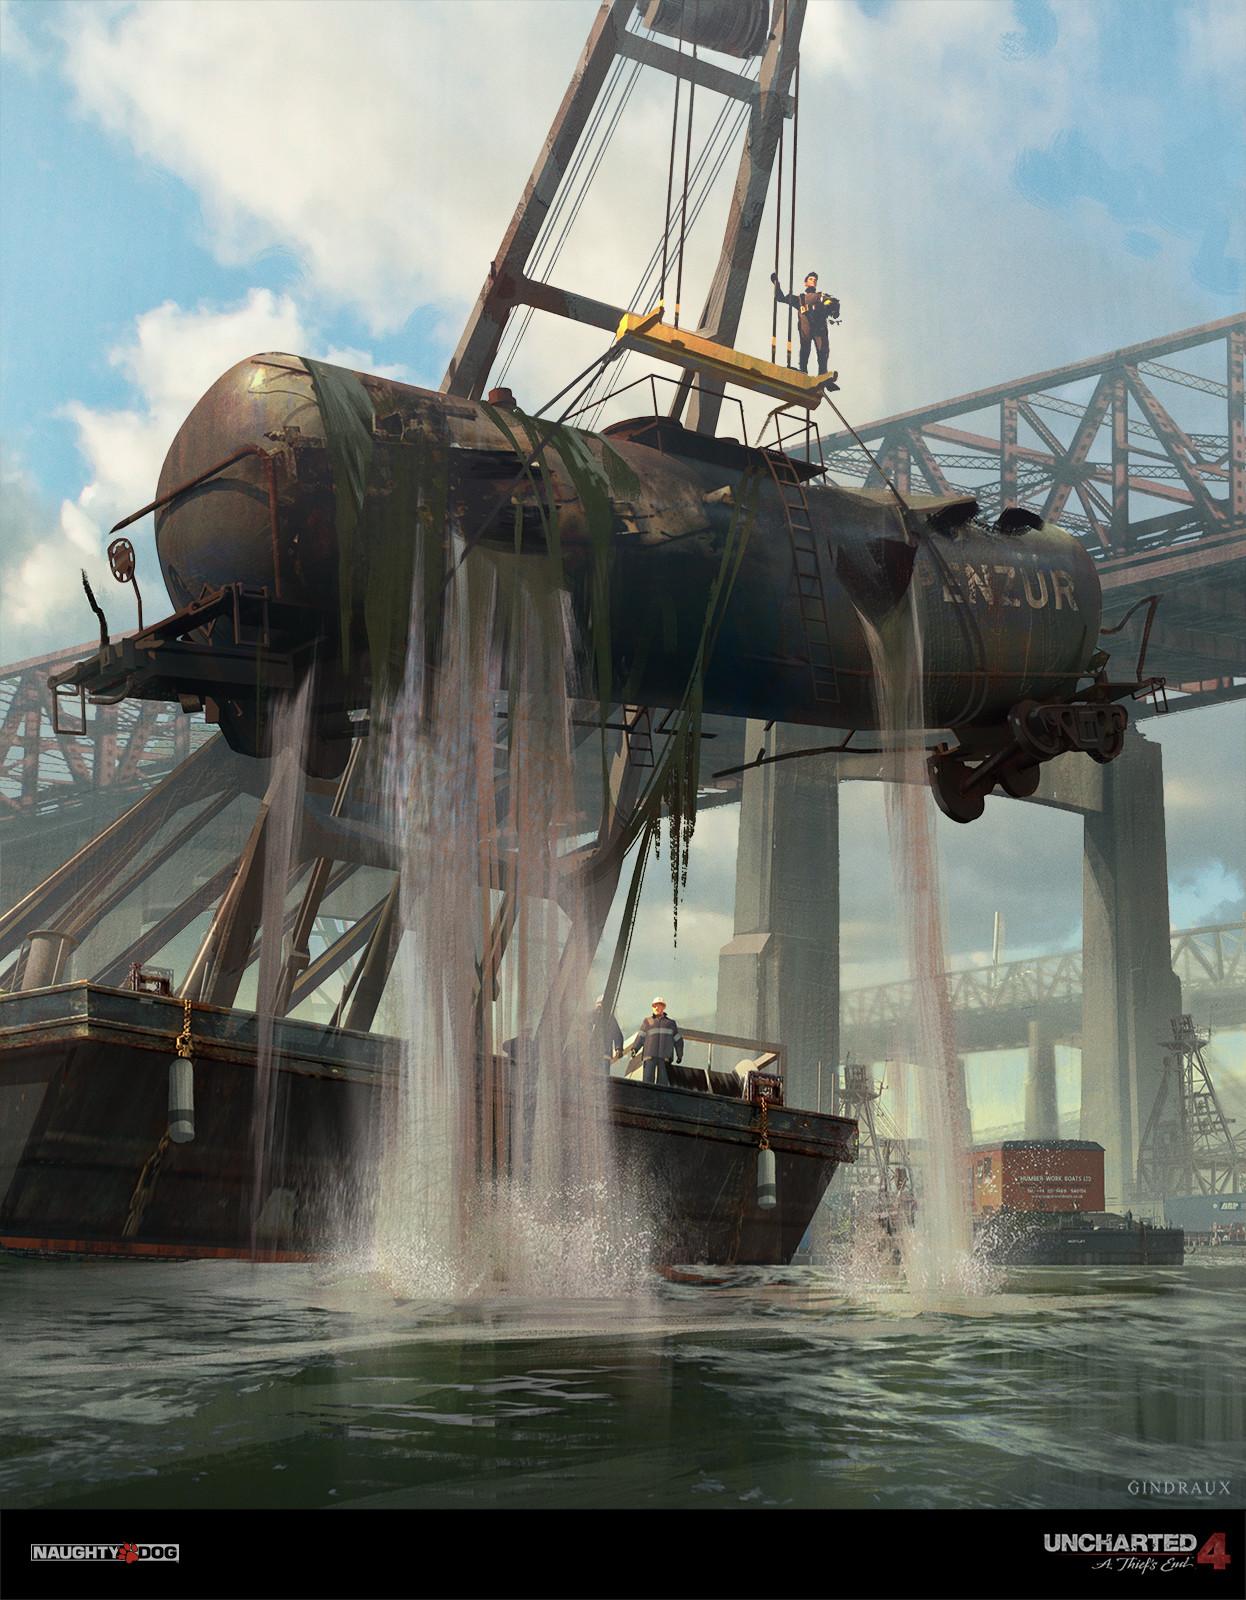 nick-gindraux-oil-tanker3-post.jpg